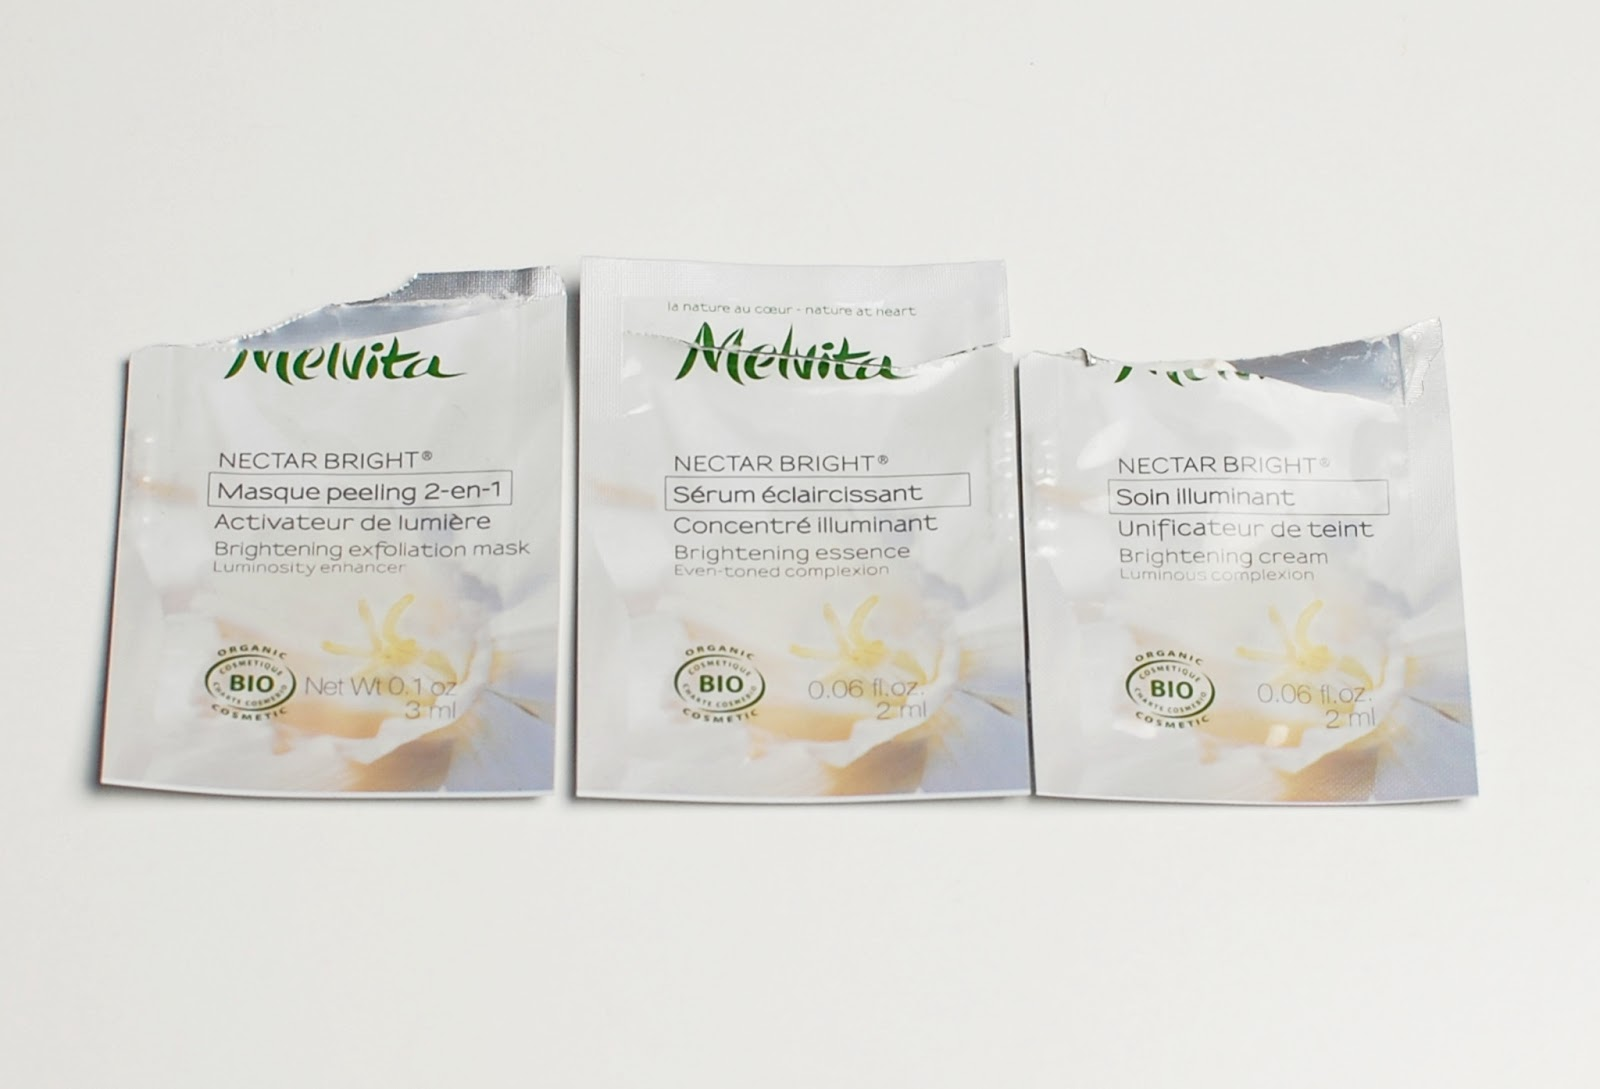 Melvita Nectar Bright